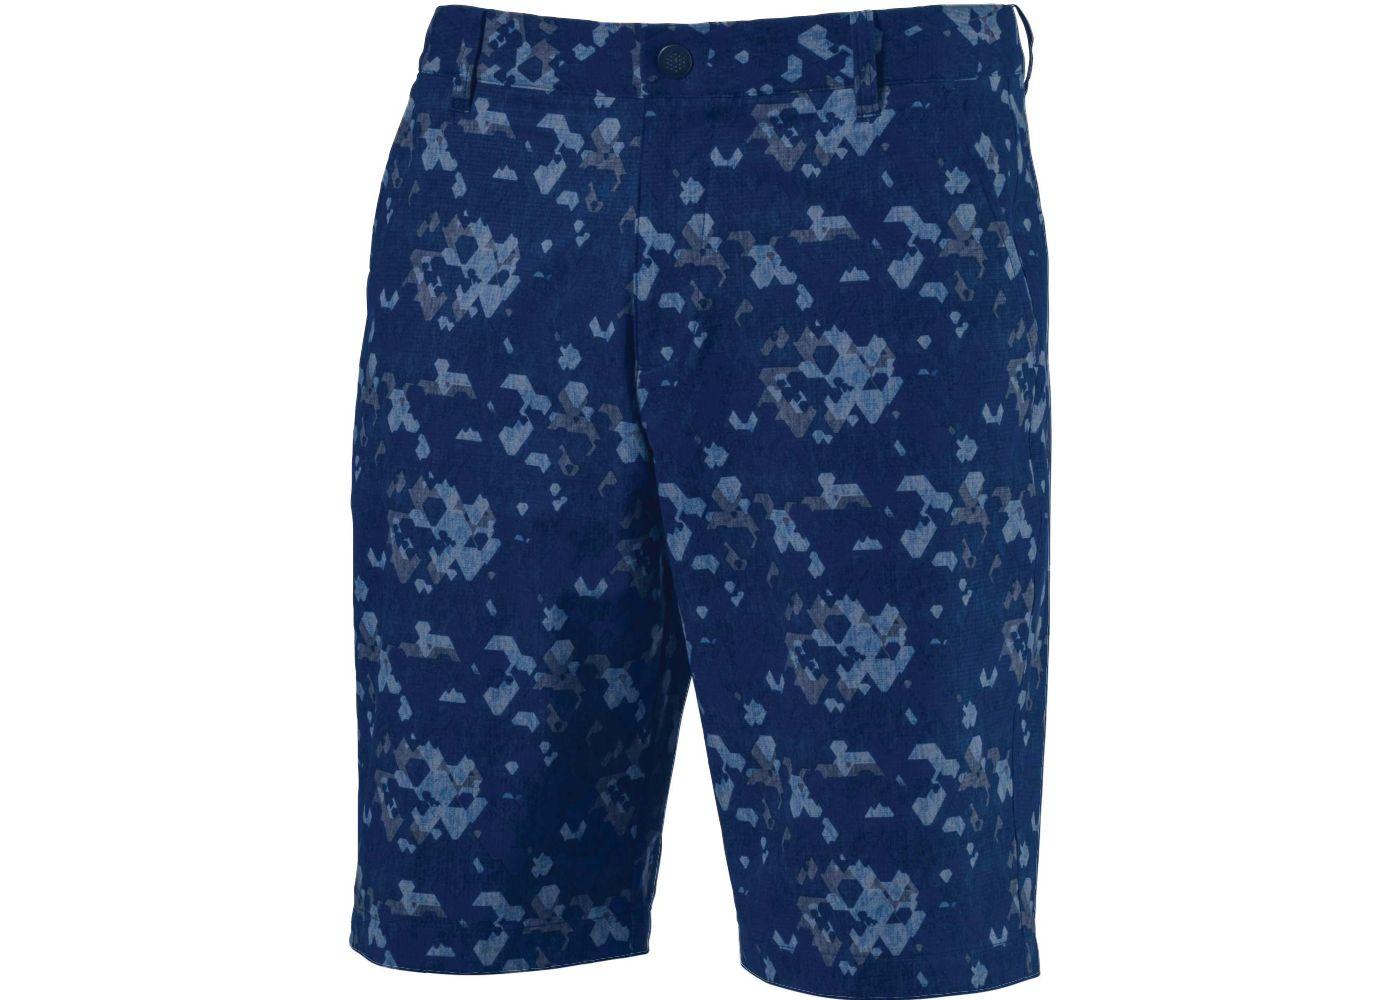 PUMA Men's Dassler Camo Golf Shorts